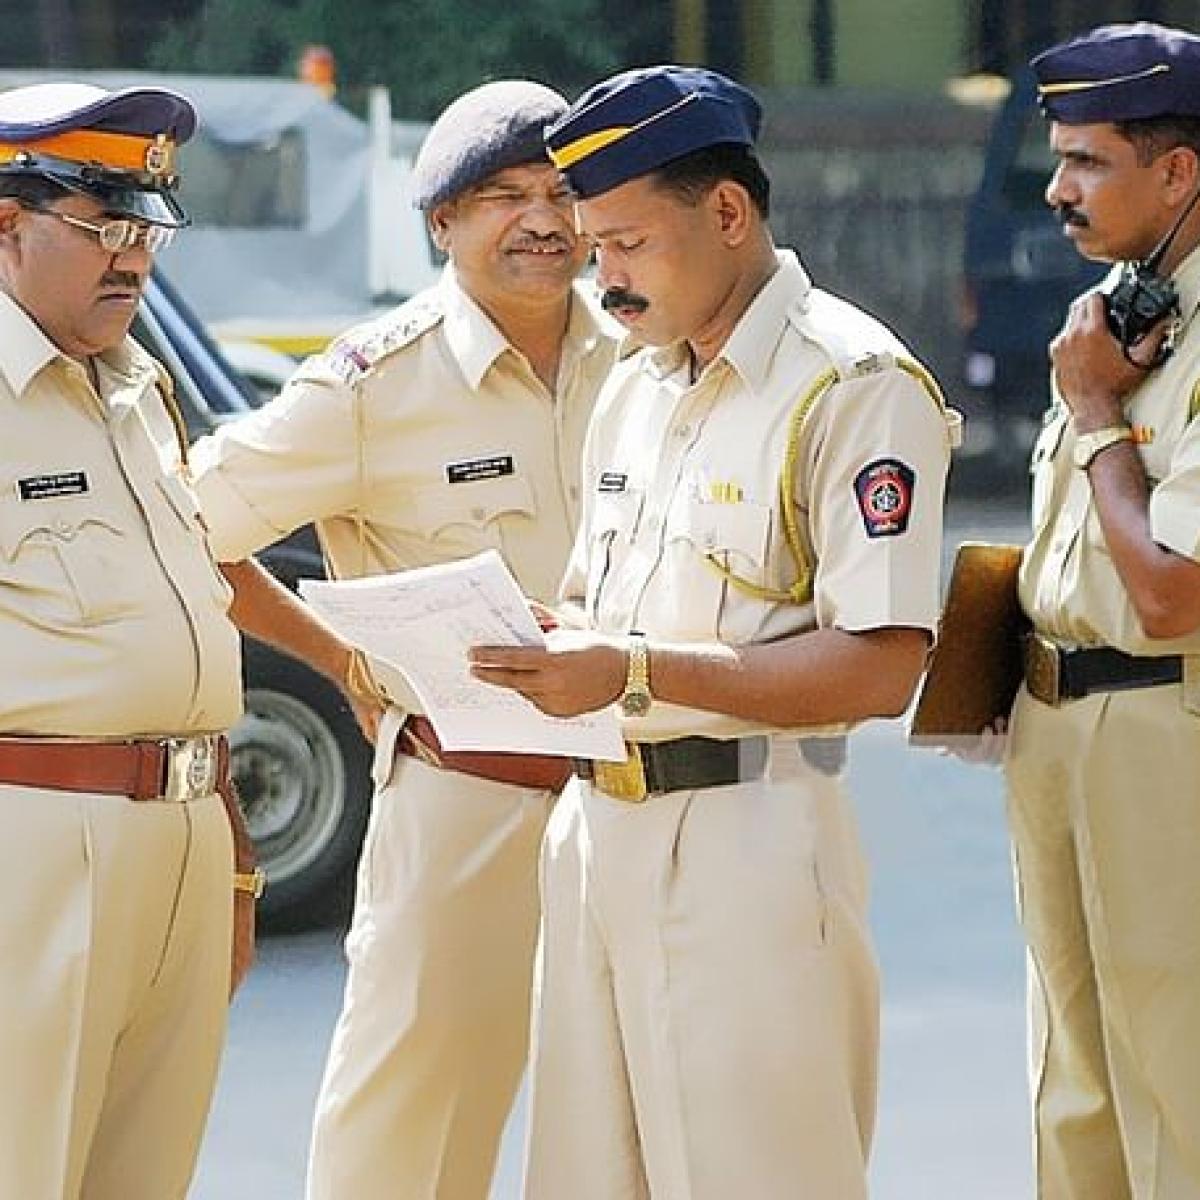 Mumbai: Police constable to accompany assault victim to hospital for medical examinations